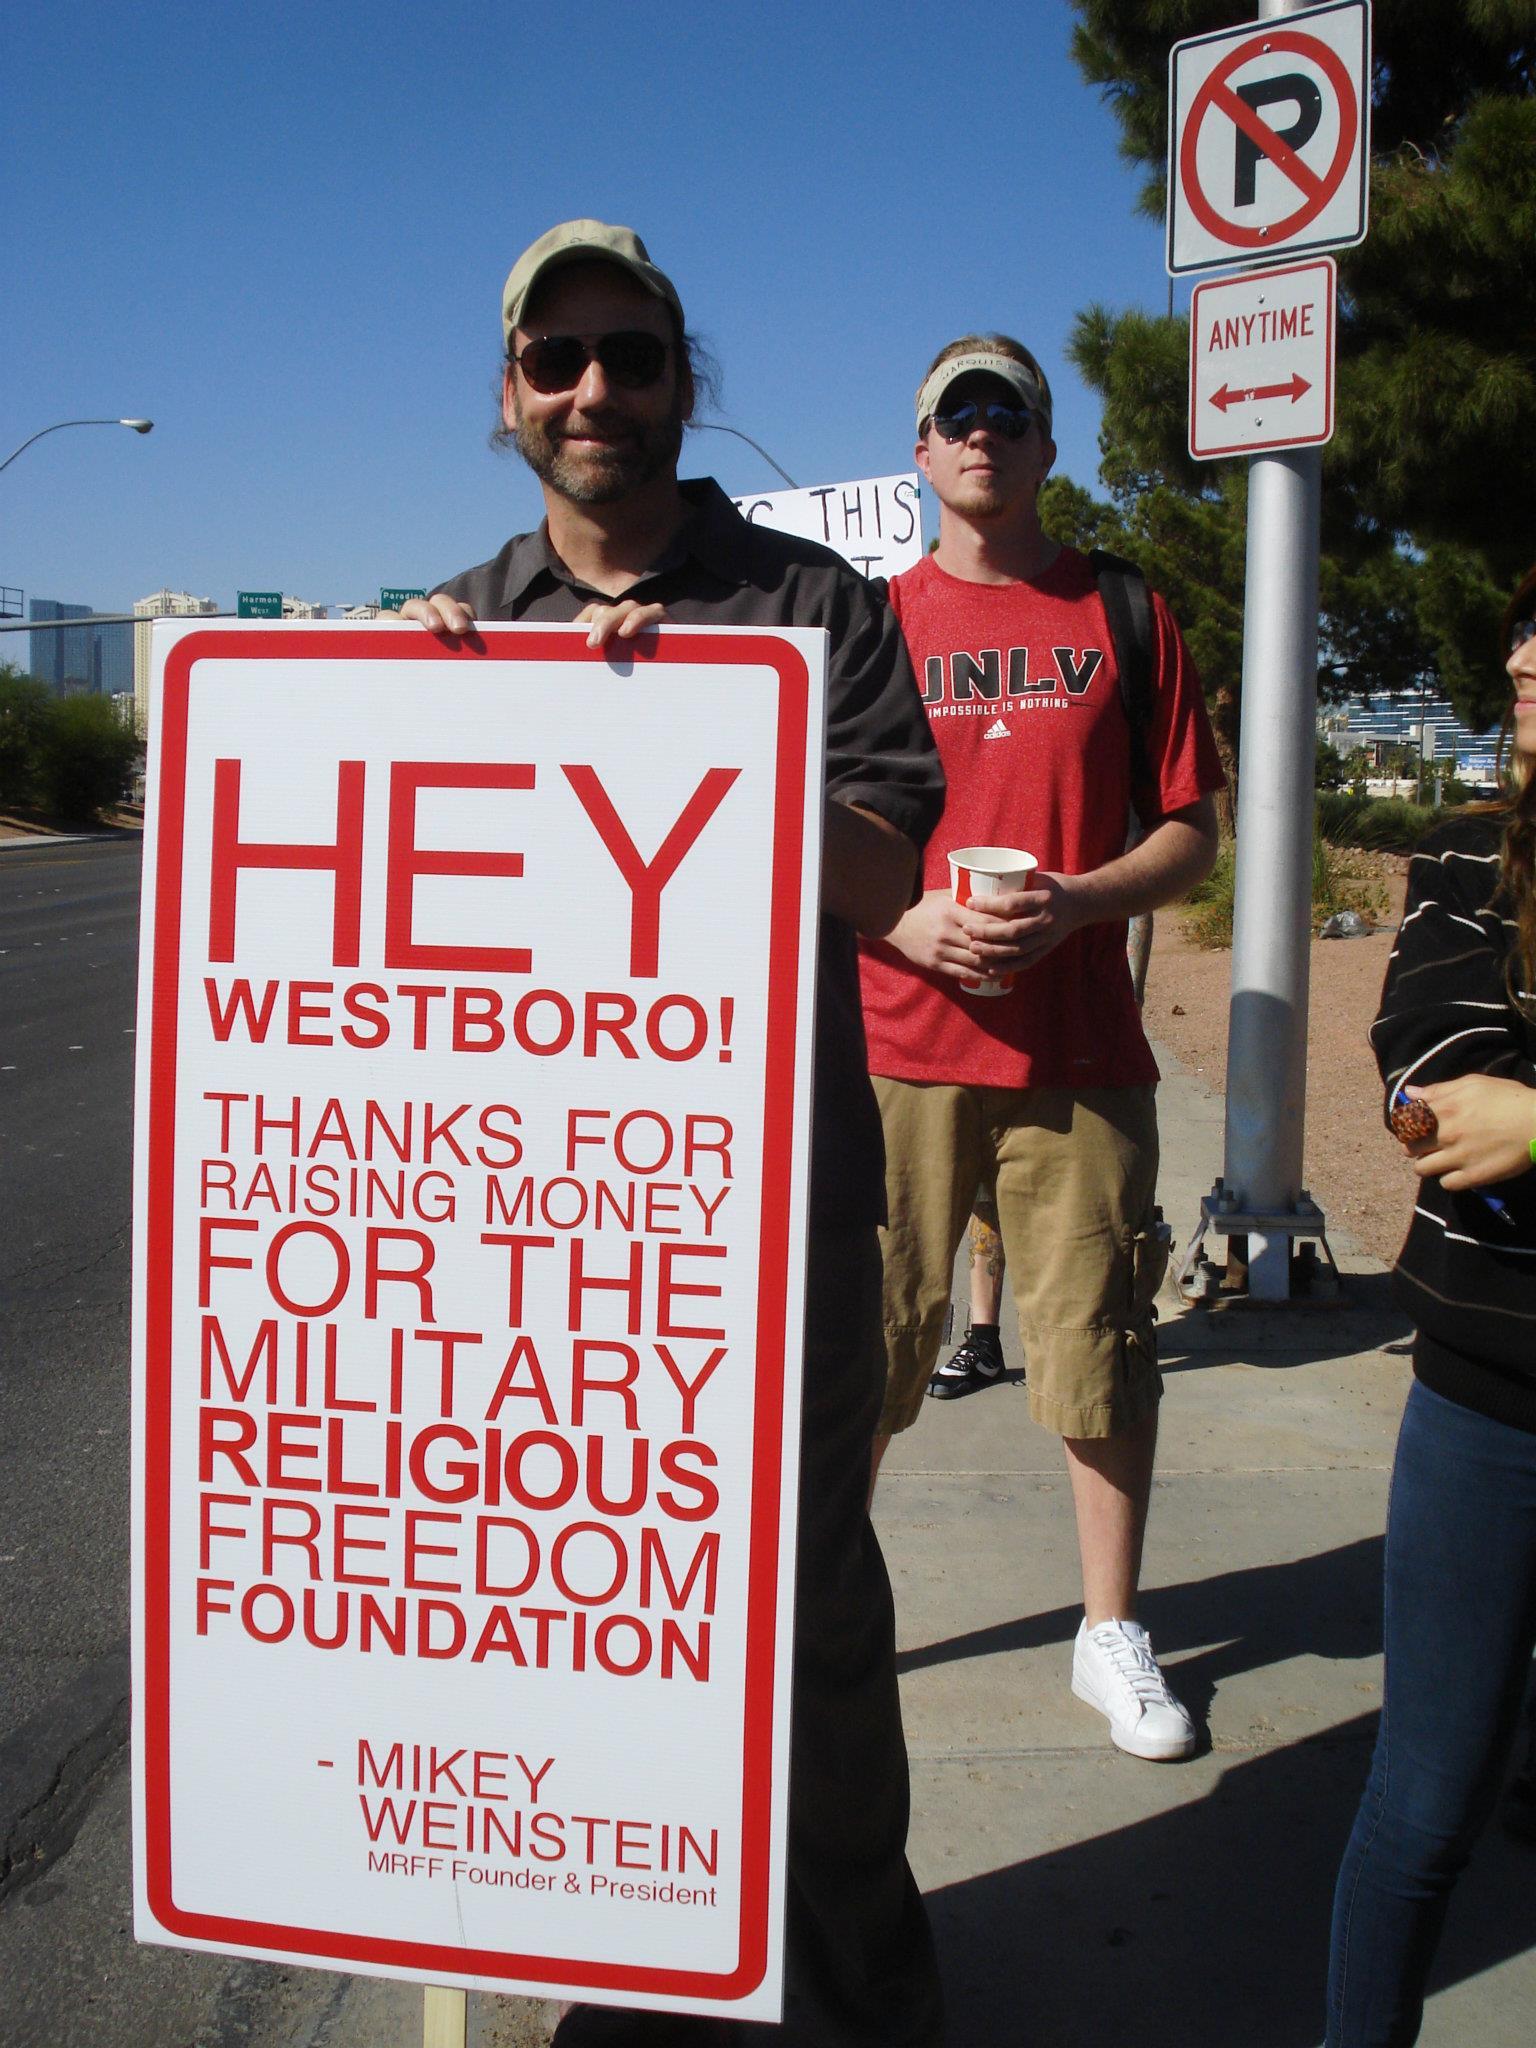 SECULAR STUDENT ALLIANCE @ UNLV – SSA/MRFF vs. Westboro ...